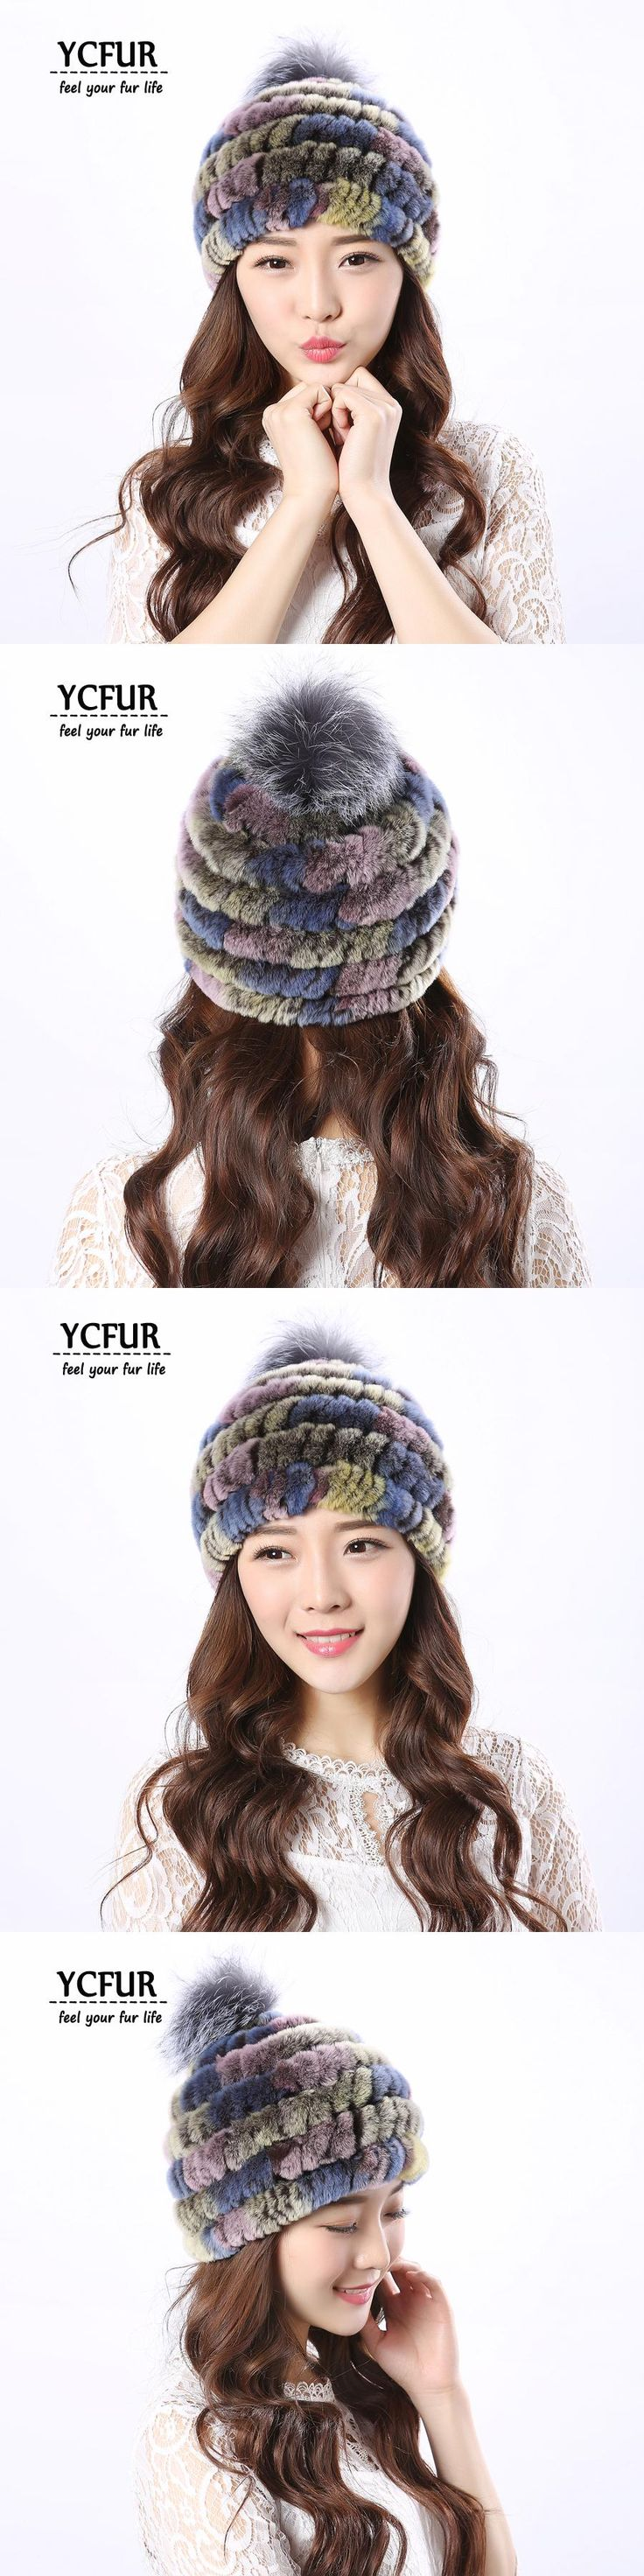 YCFUR Women Caps Hats Winter Autumn Knit Real Rex Rabbit Fur Hats With Silver Fox Fur Pom Pom Hat Beanie For Girls